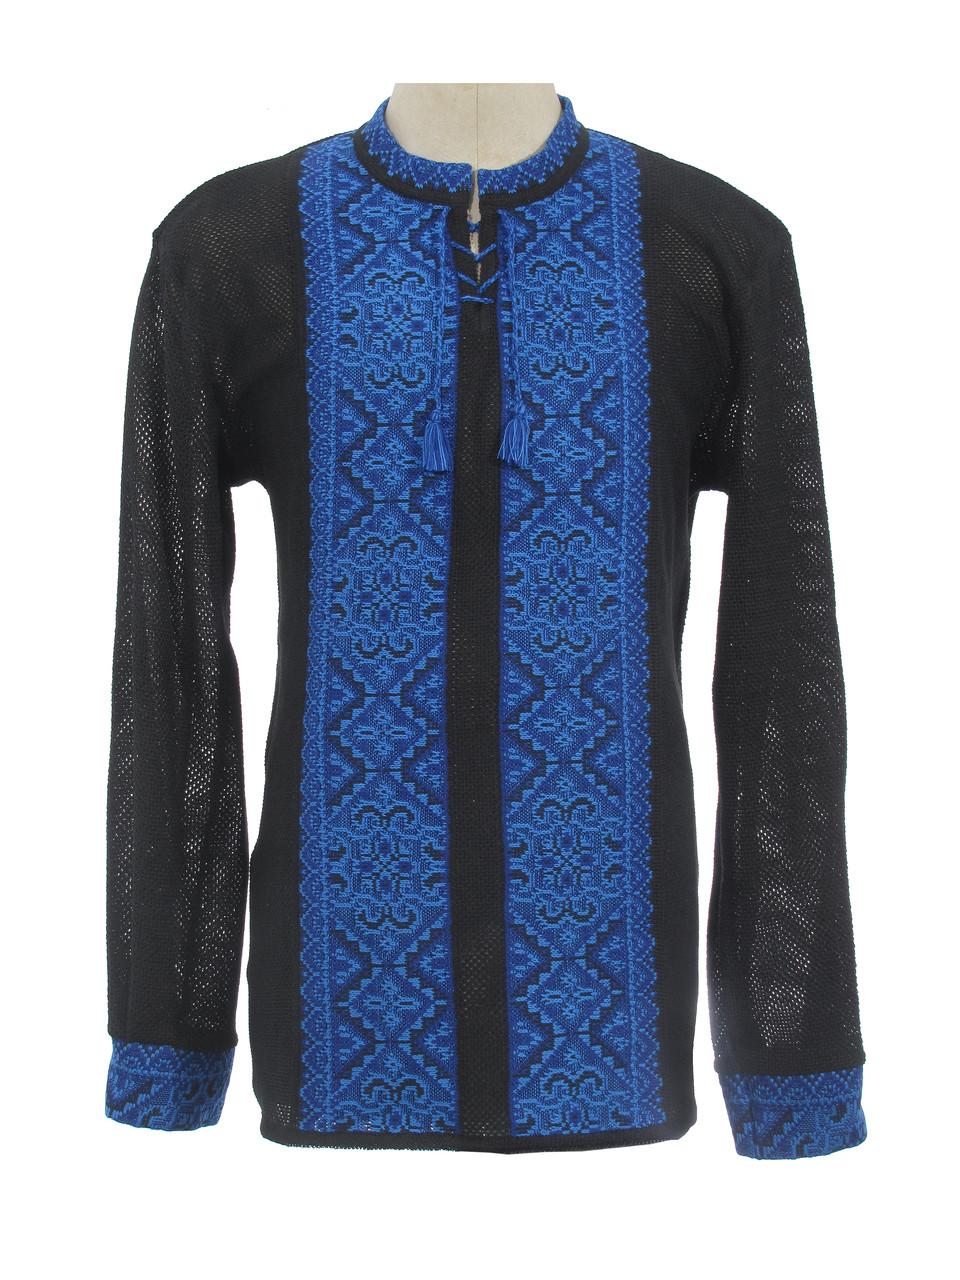 Мужская вязаная рубашка Влад синий (х/б)